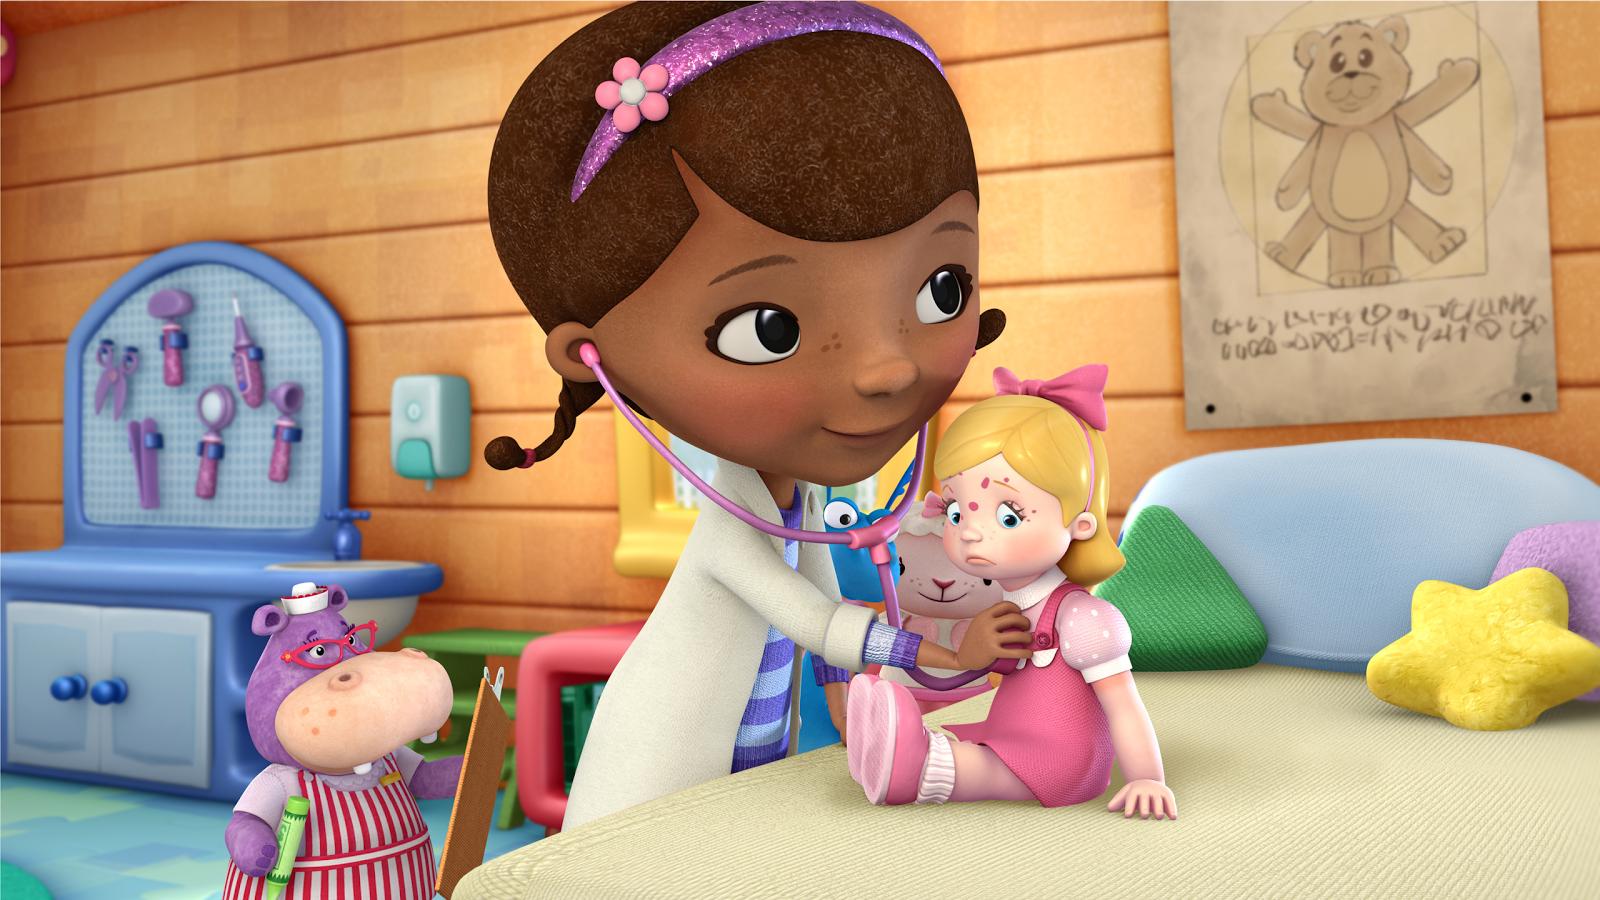 Doc Mcstuffins Disney Junior Animation Cartoon HD